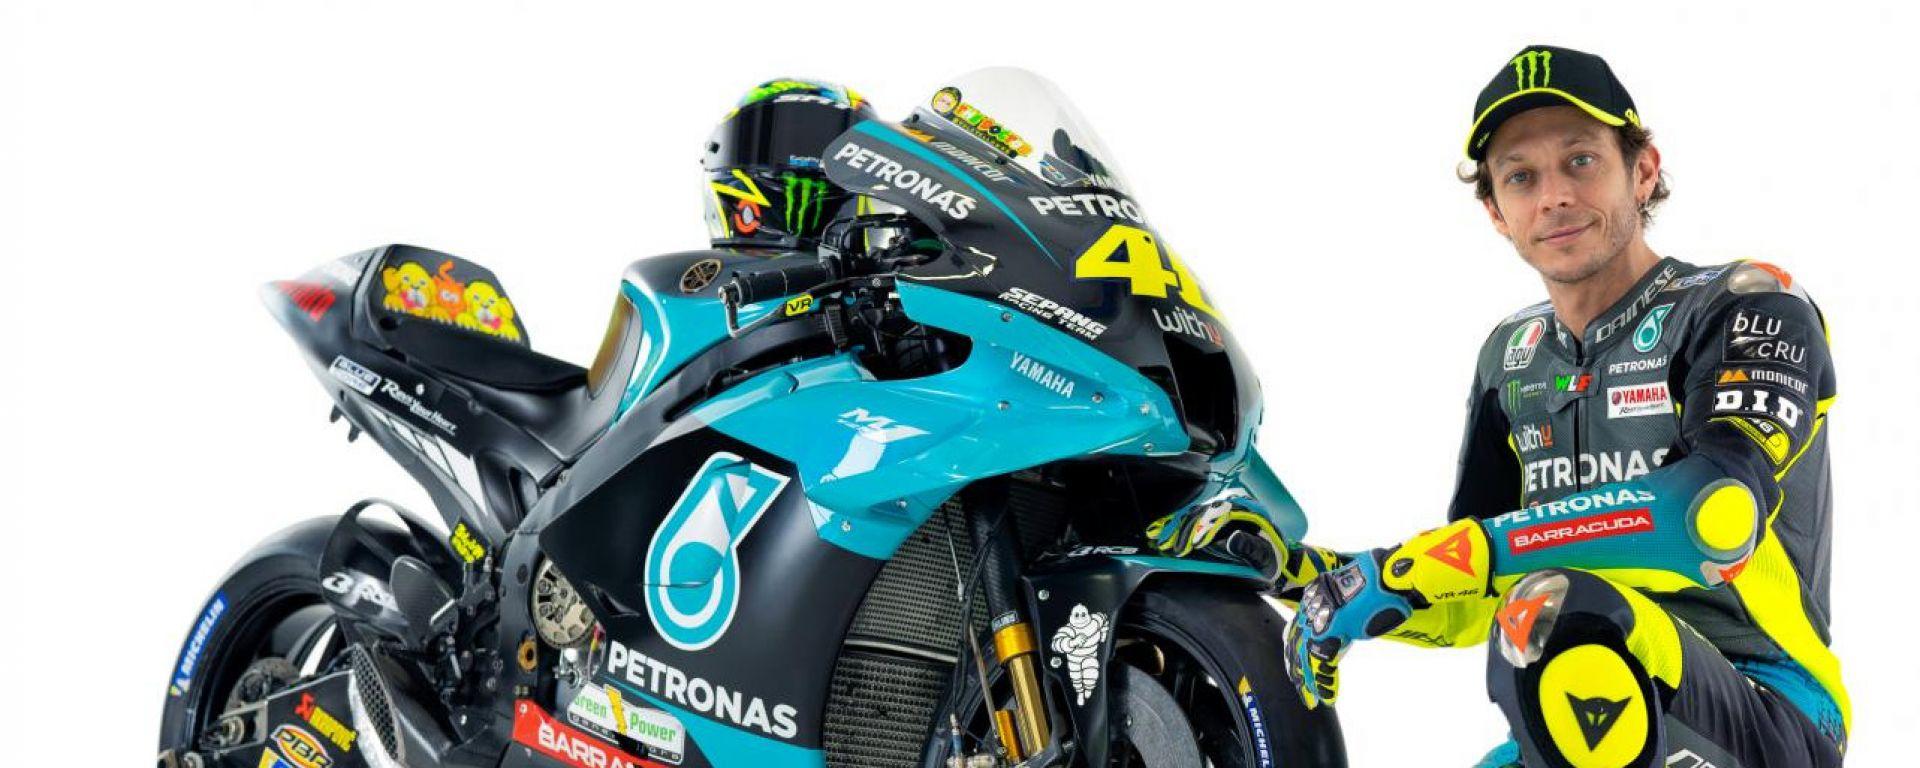 MotoGP 2021, Yamaha Petronas SRT, Yamaha YZR-M1: Valentino Rossi